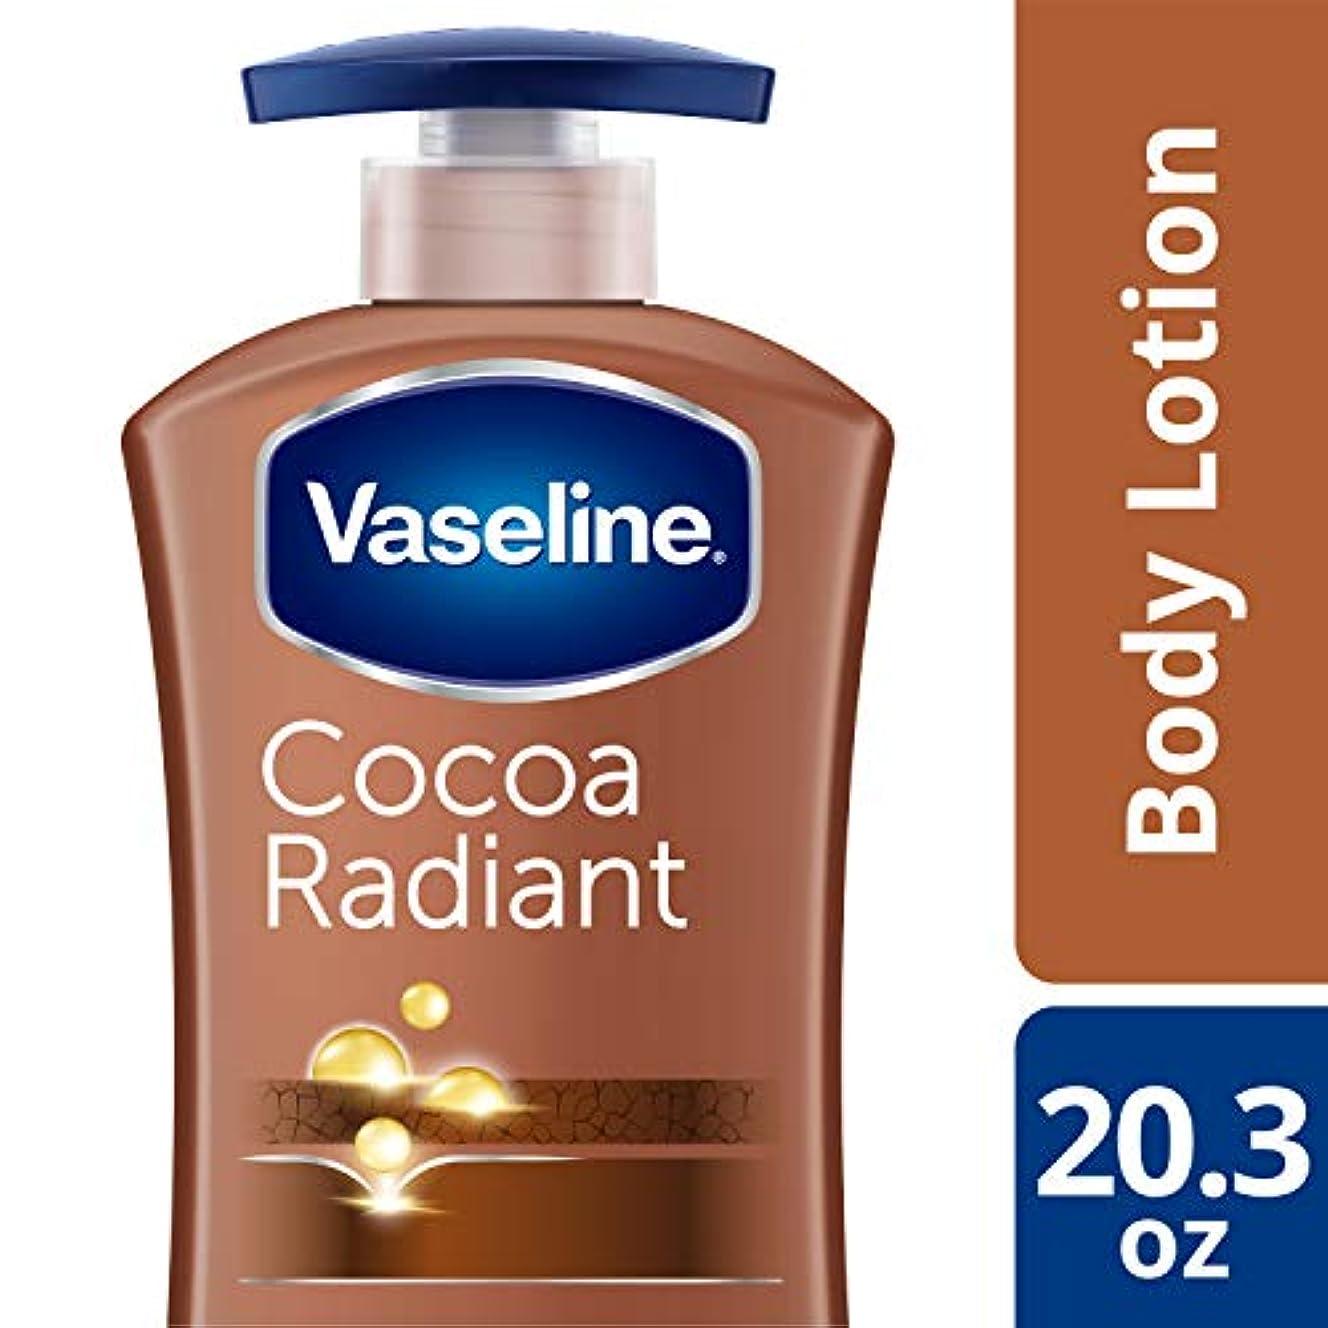 Vaseline Intensive Care Lotion, Cocoa Radiant 20.3 Oz